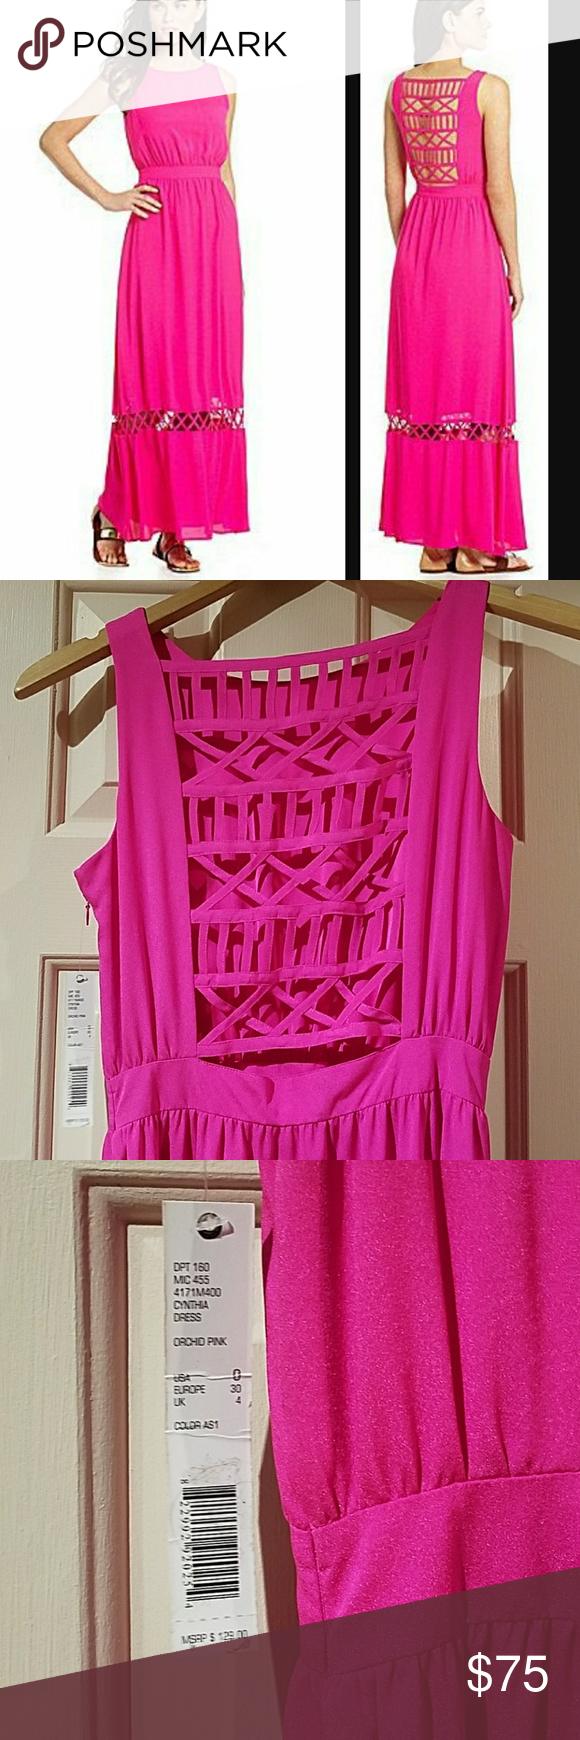 Nwt gianni bini cynthia dress hot pink nwt hot pink maxi